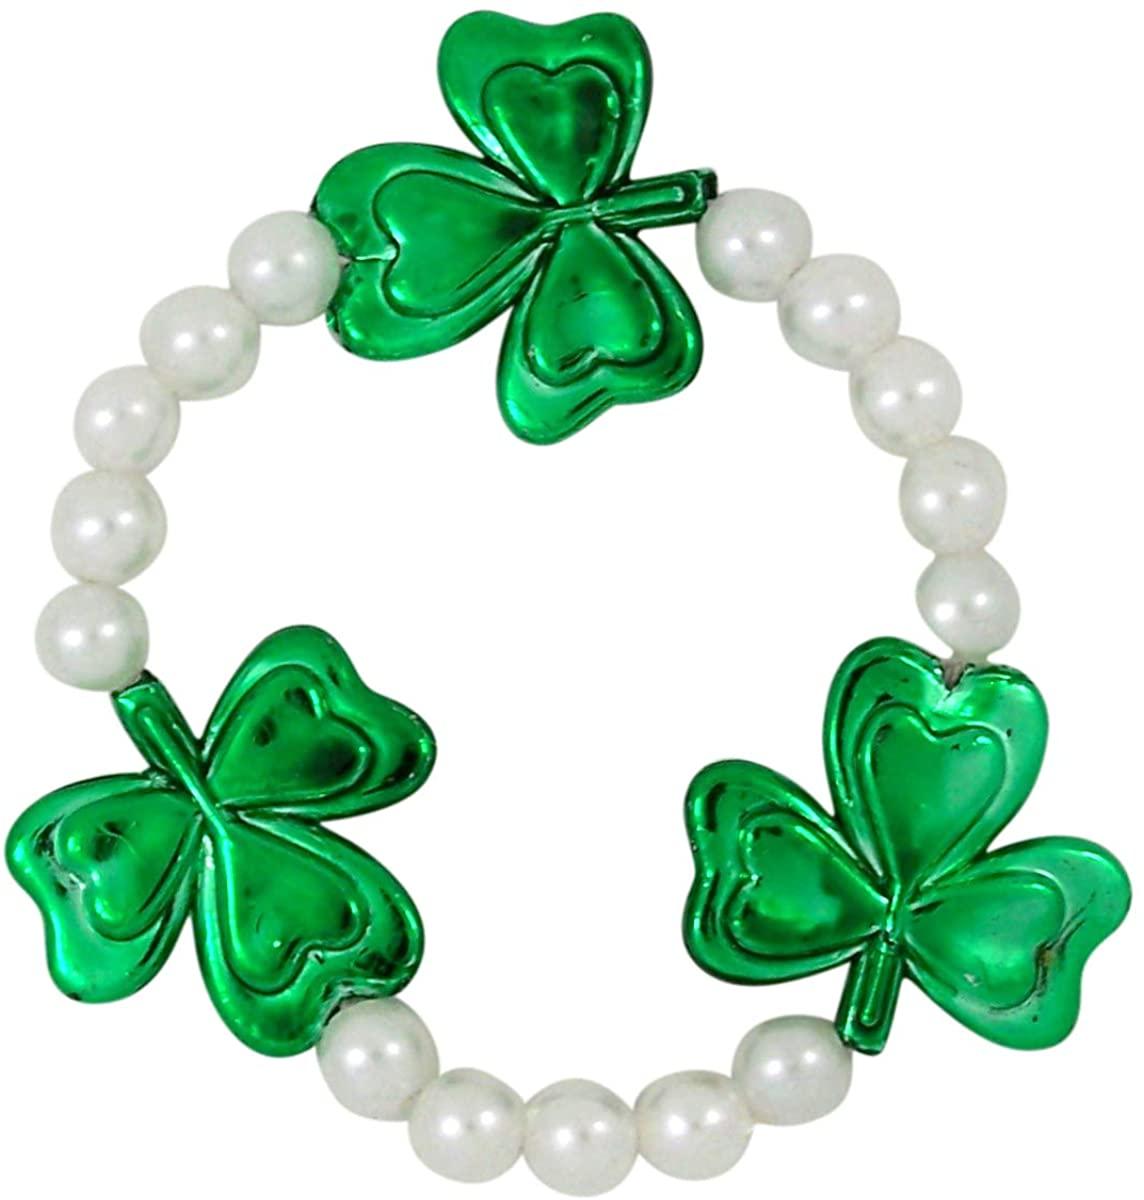 Green and White Shamrock Bead St Patricks Day Bracelet, 7 Inch